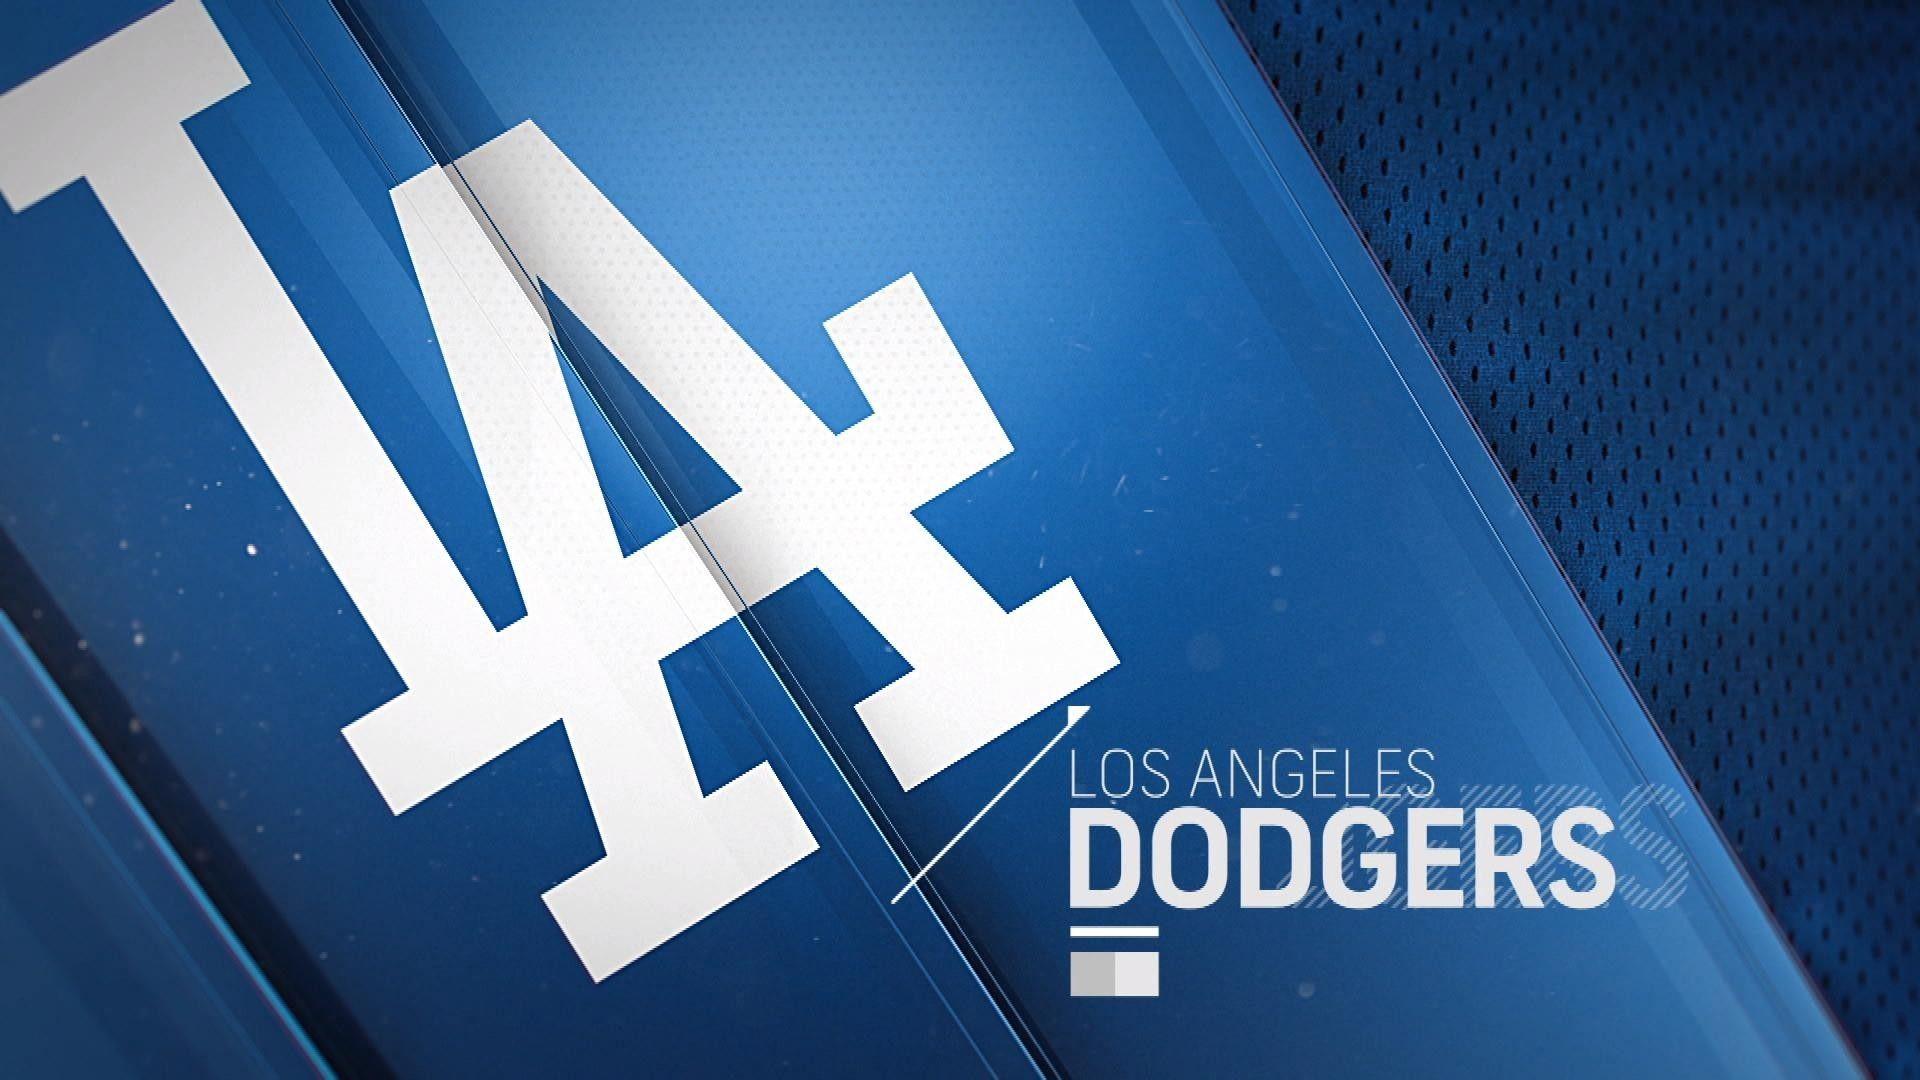 Dodgers full hd wallpaper for laptop